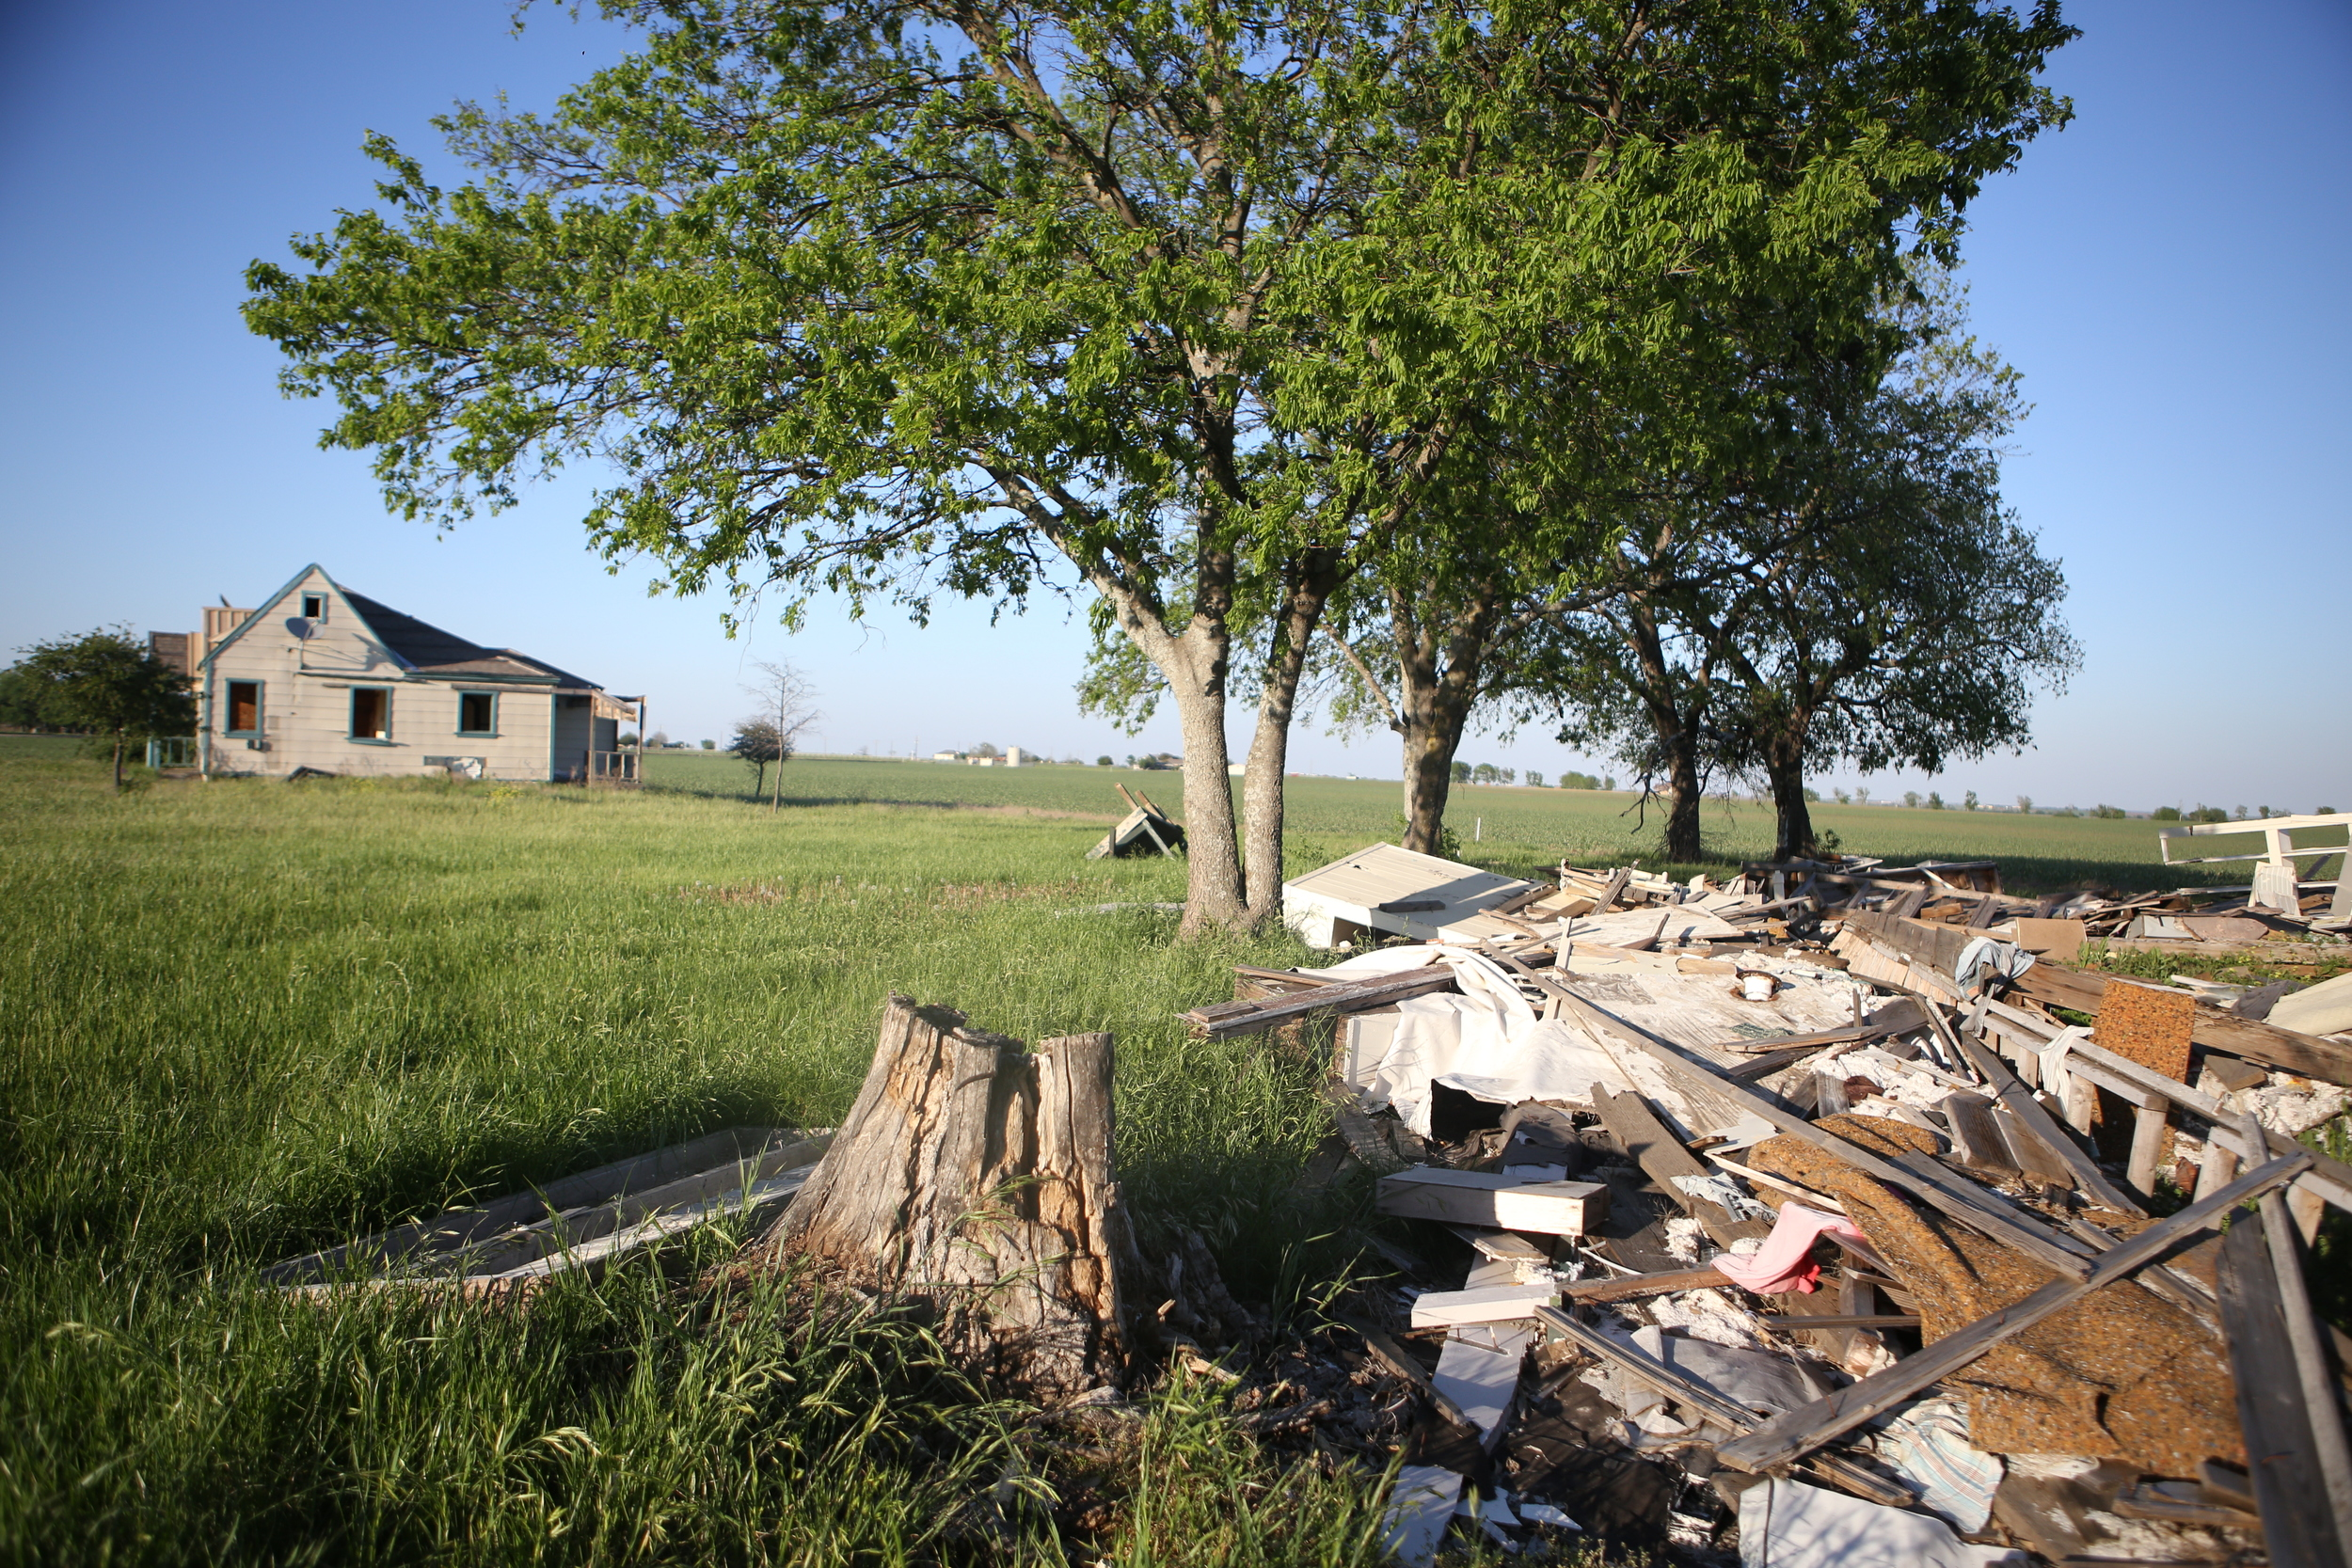 West, TX Explosion